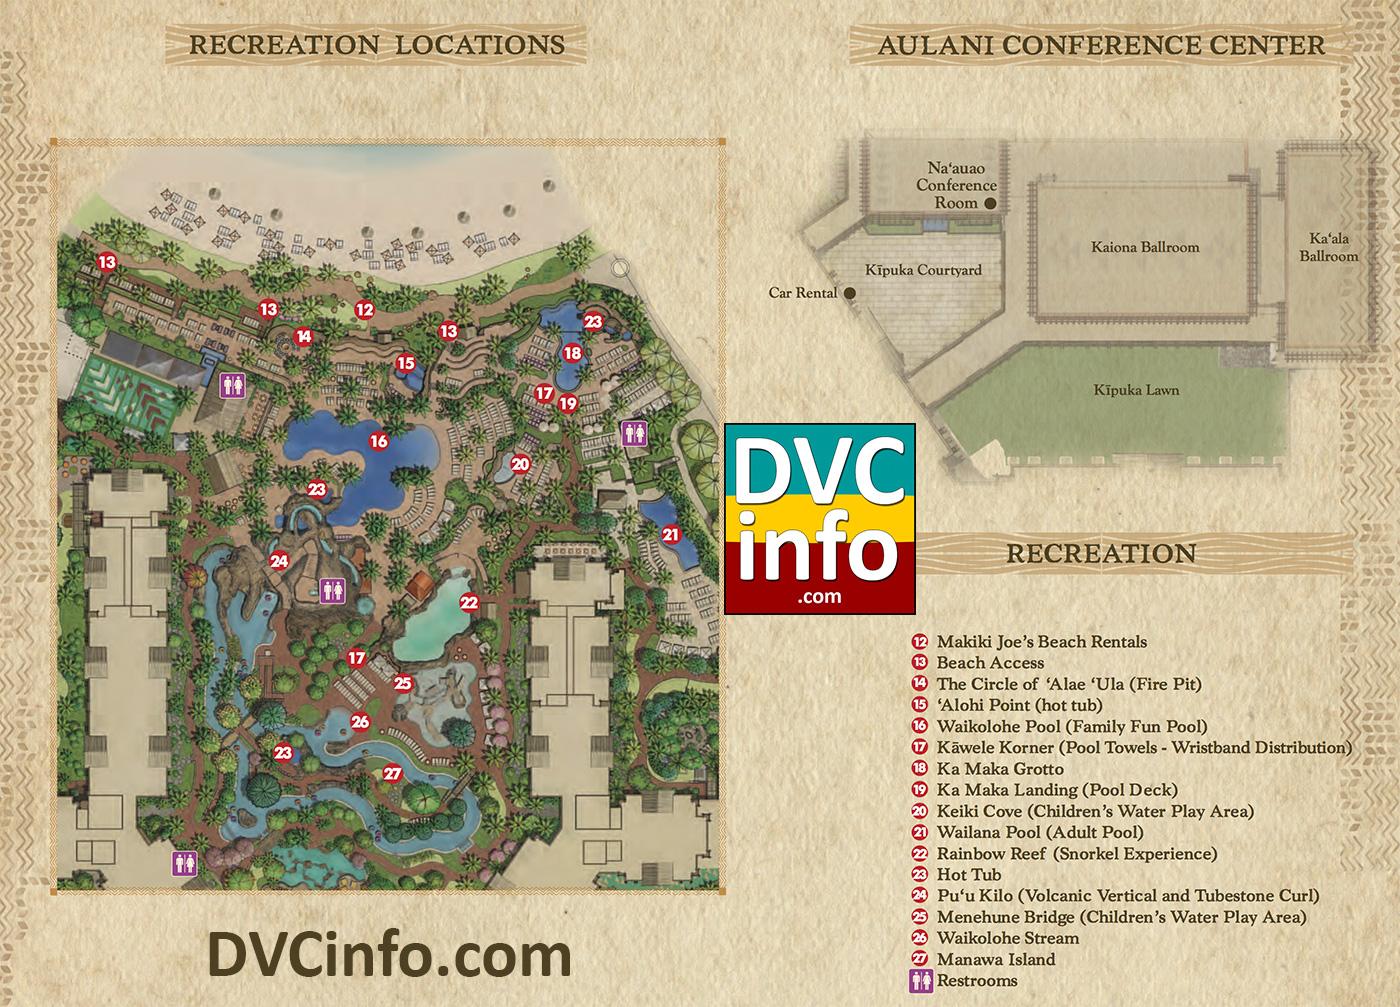 Aulani A Disney Resort Amp Spa Dvcinfo